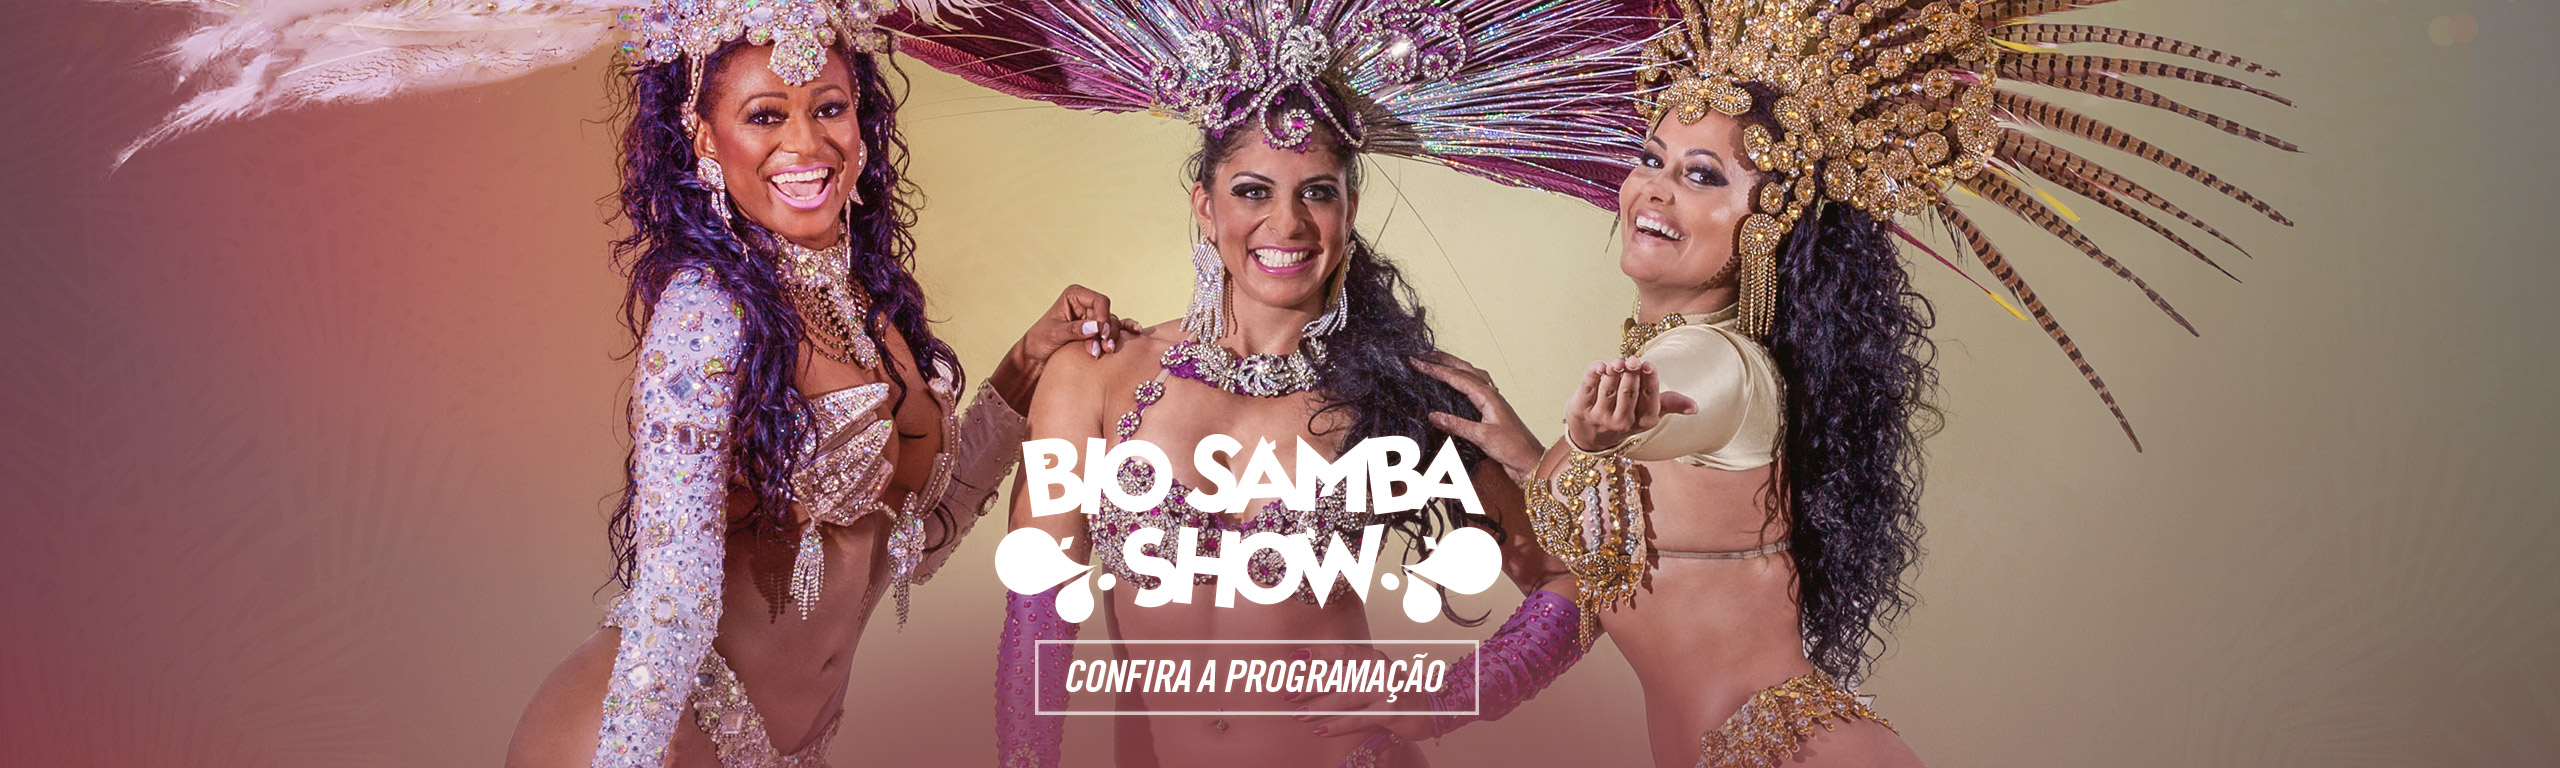 Banner_home_biosamba